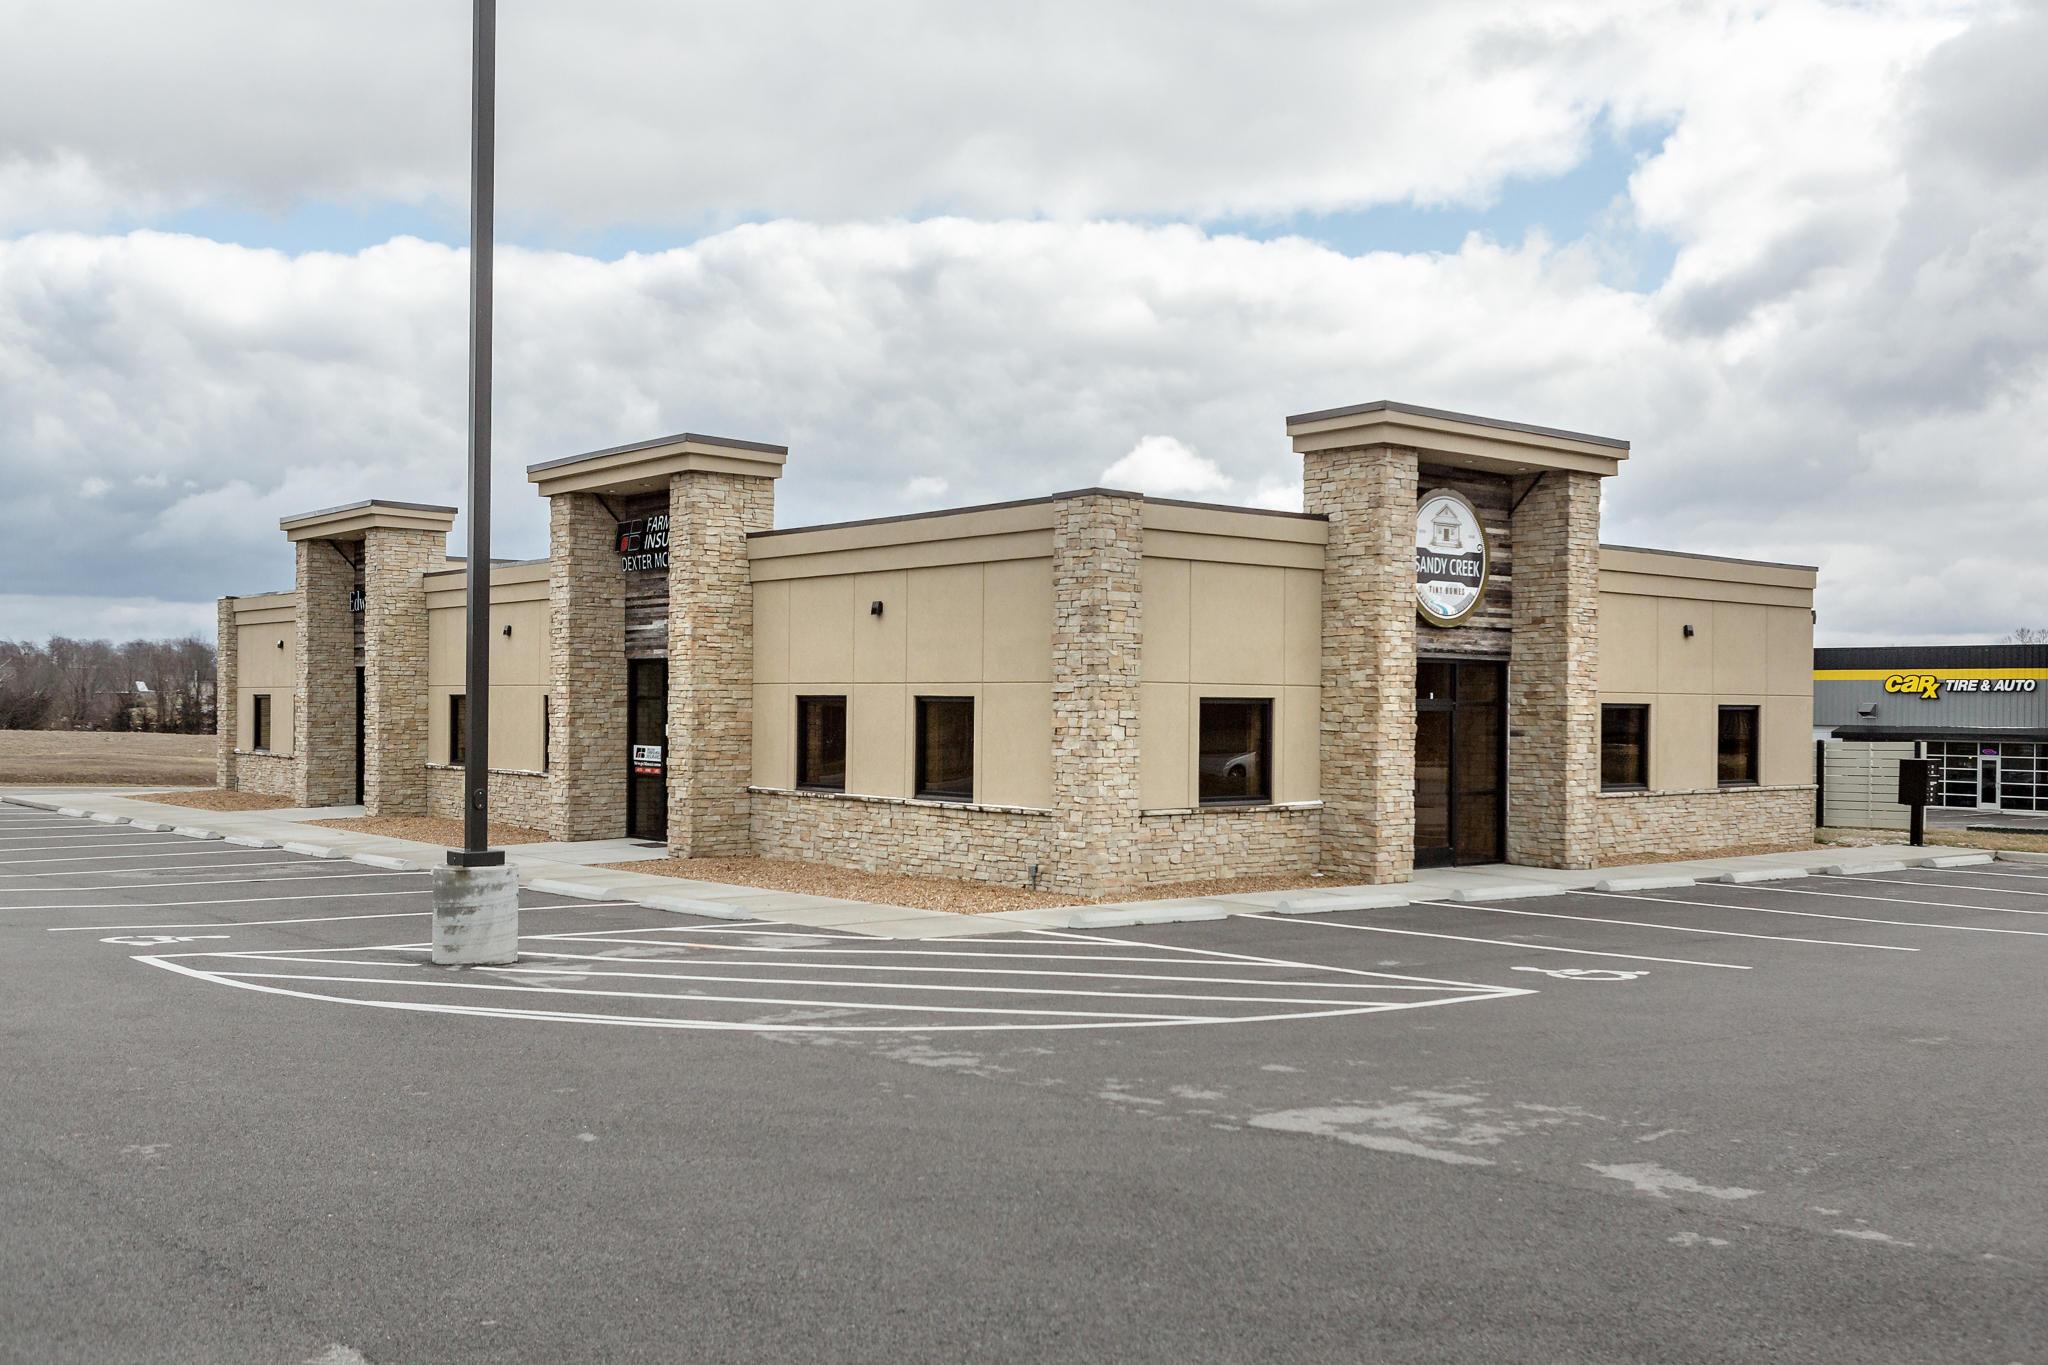 Property for sale at 103 West Proctor, Willard,  Missouri 65781